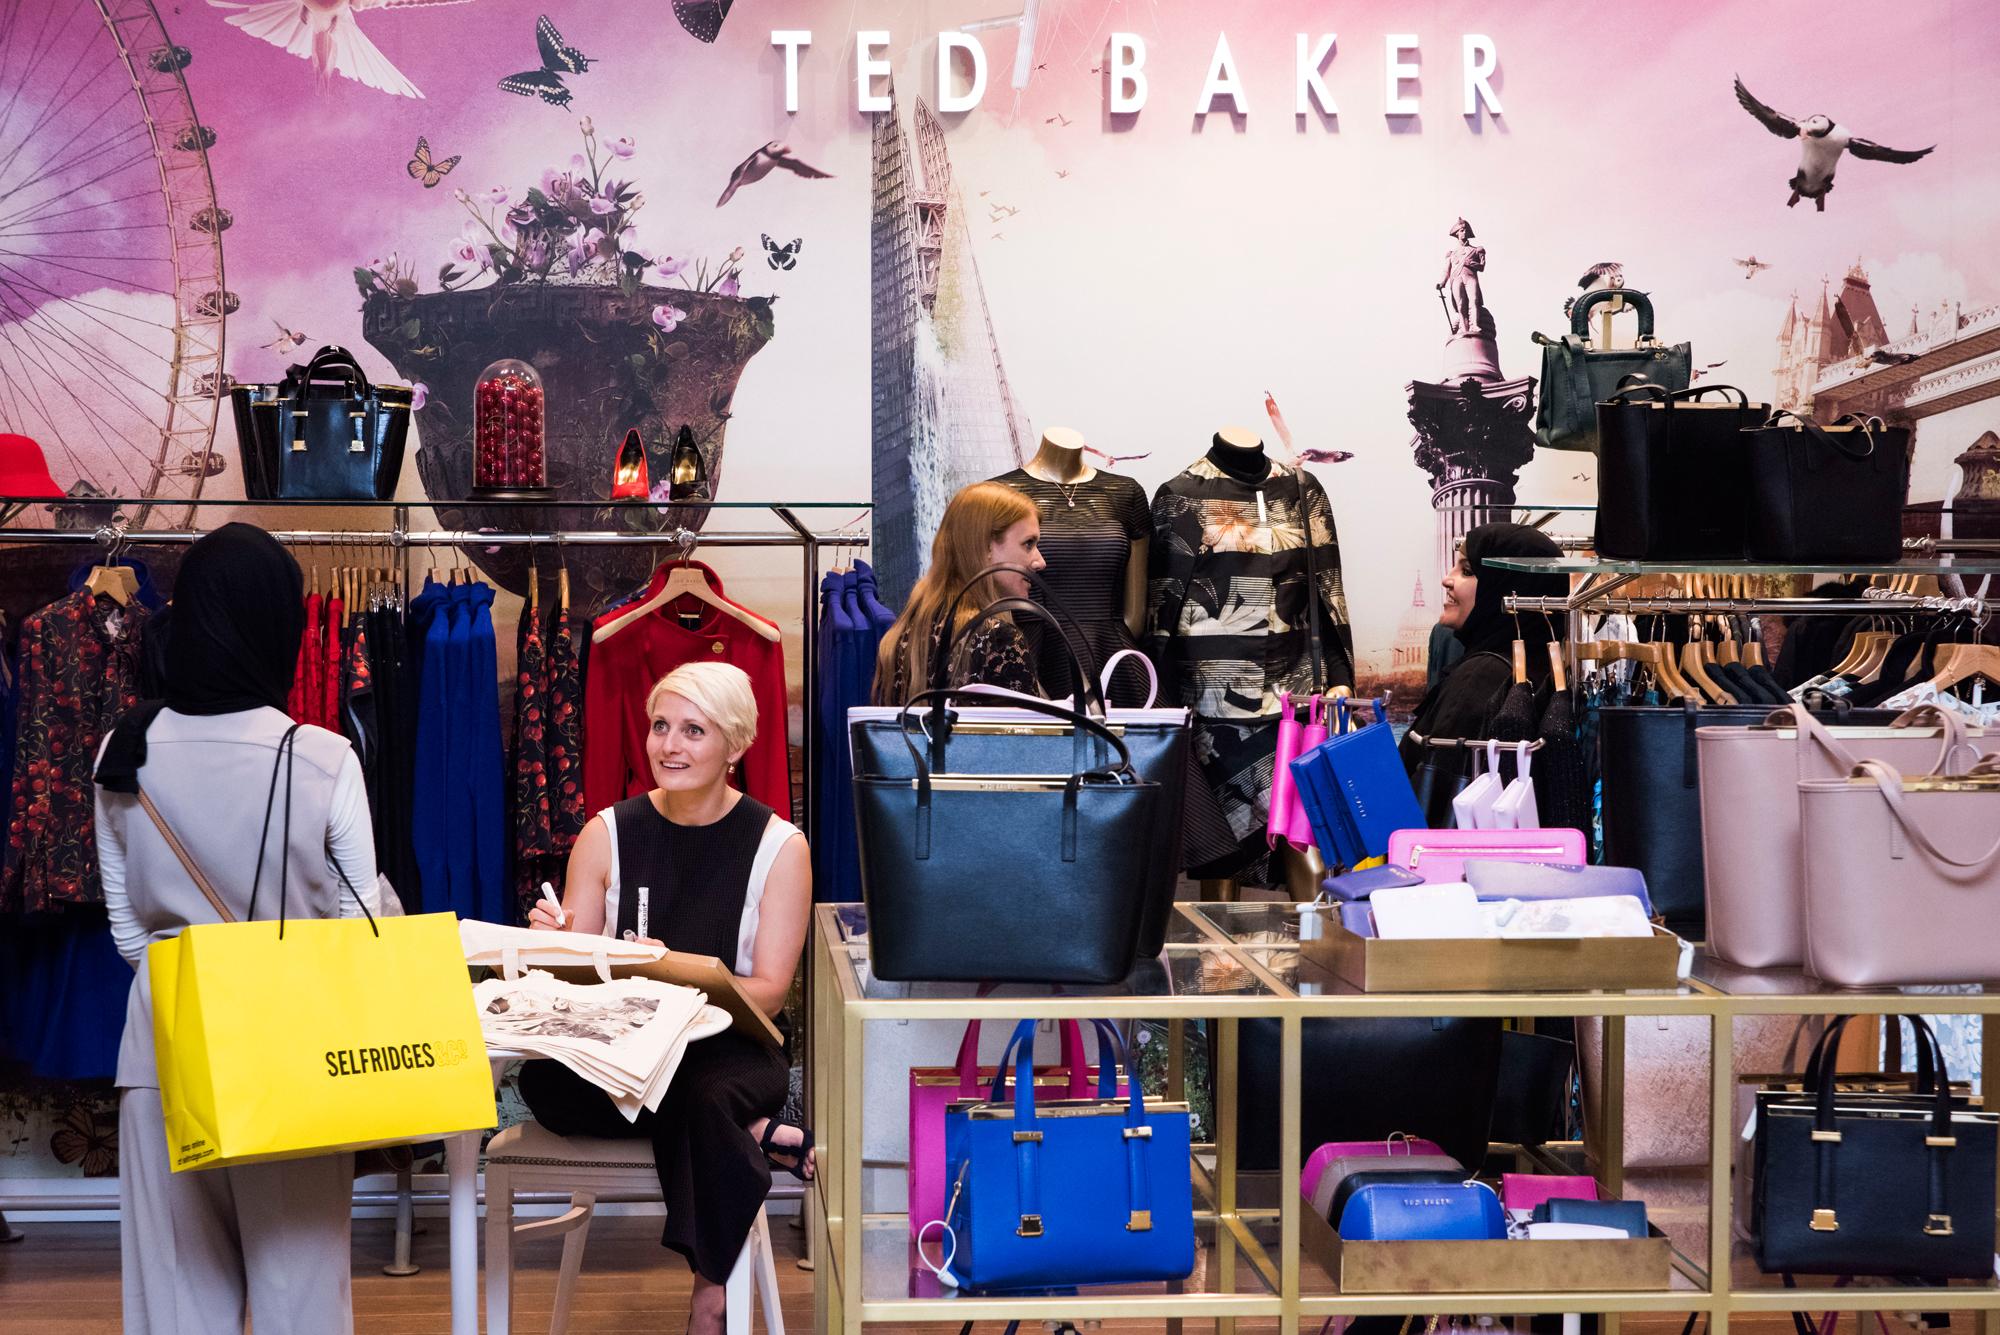 Ted Baker at Selfridges